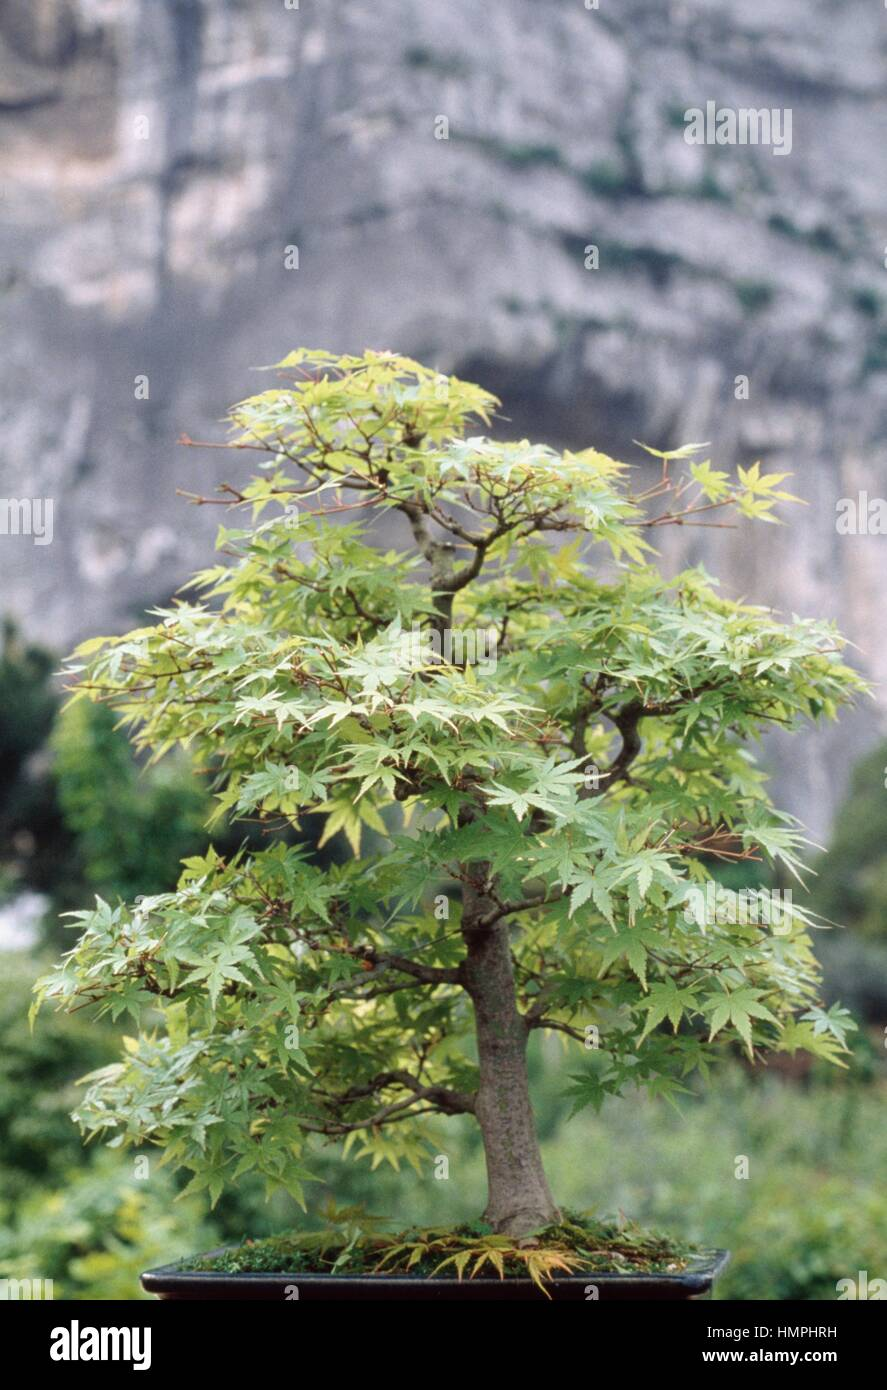 Japanese Maple Bonsai Acer Palmatum Aceraceae After Defoliation Stock Photo Alamy